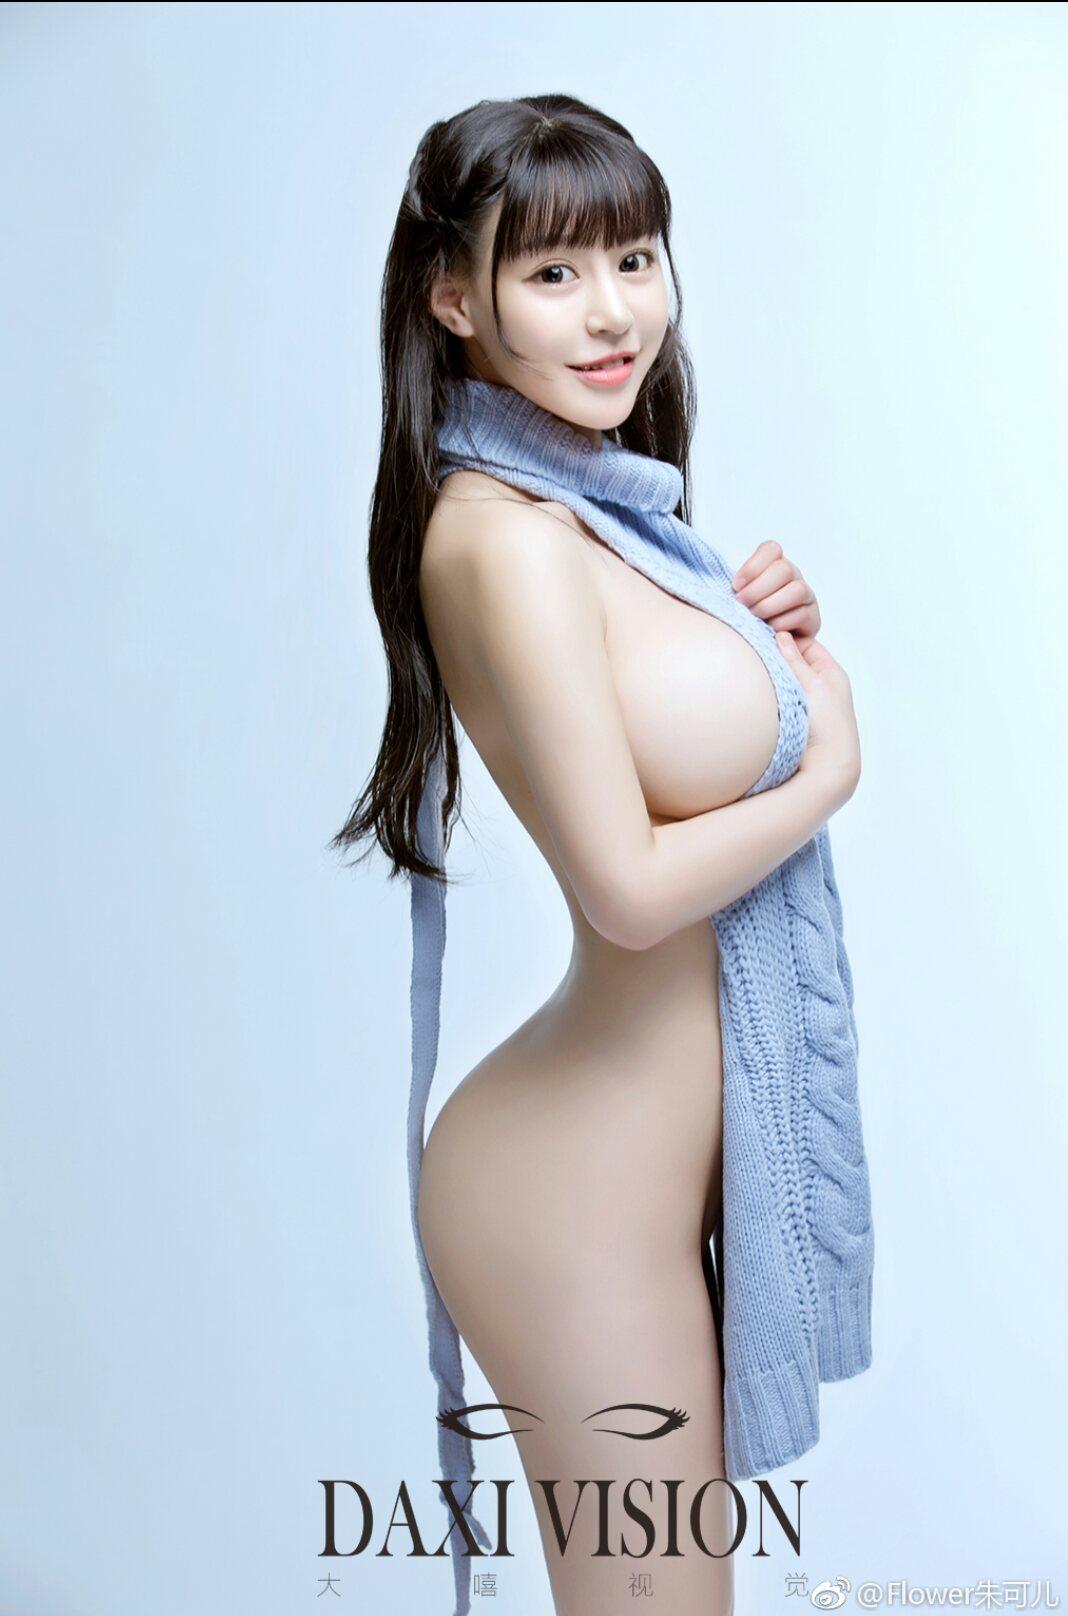 image http://scanlover.com/assets/images/7847-Ev90Vcg6CDZoc9r9.jpeg